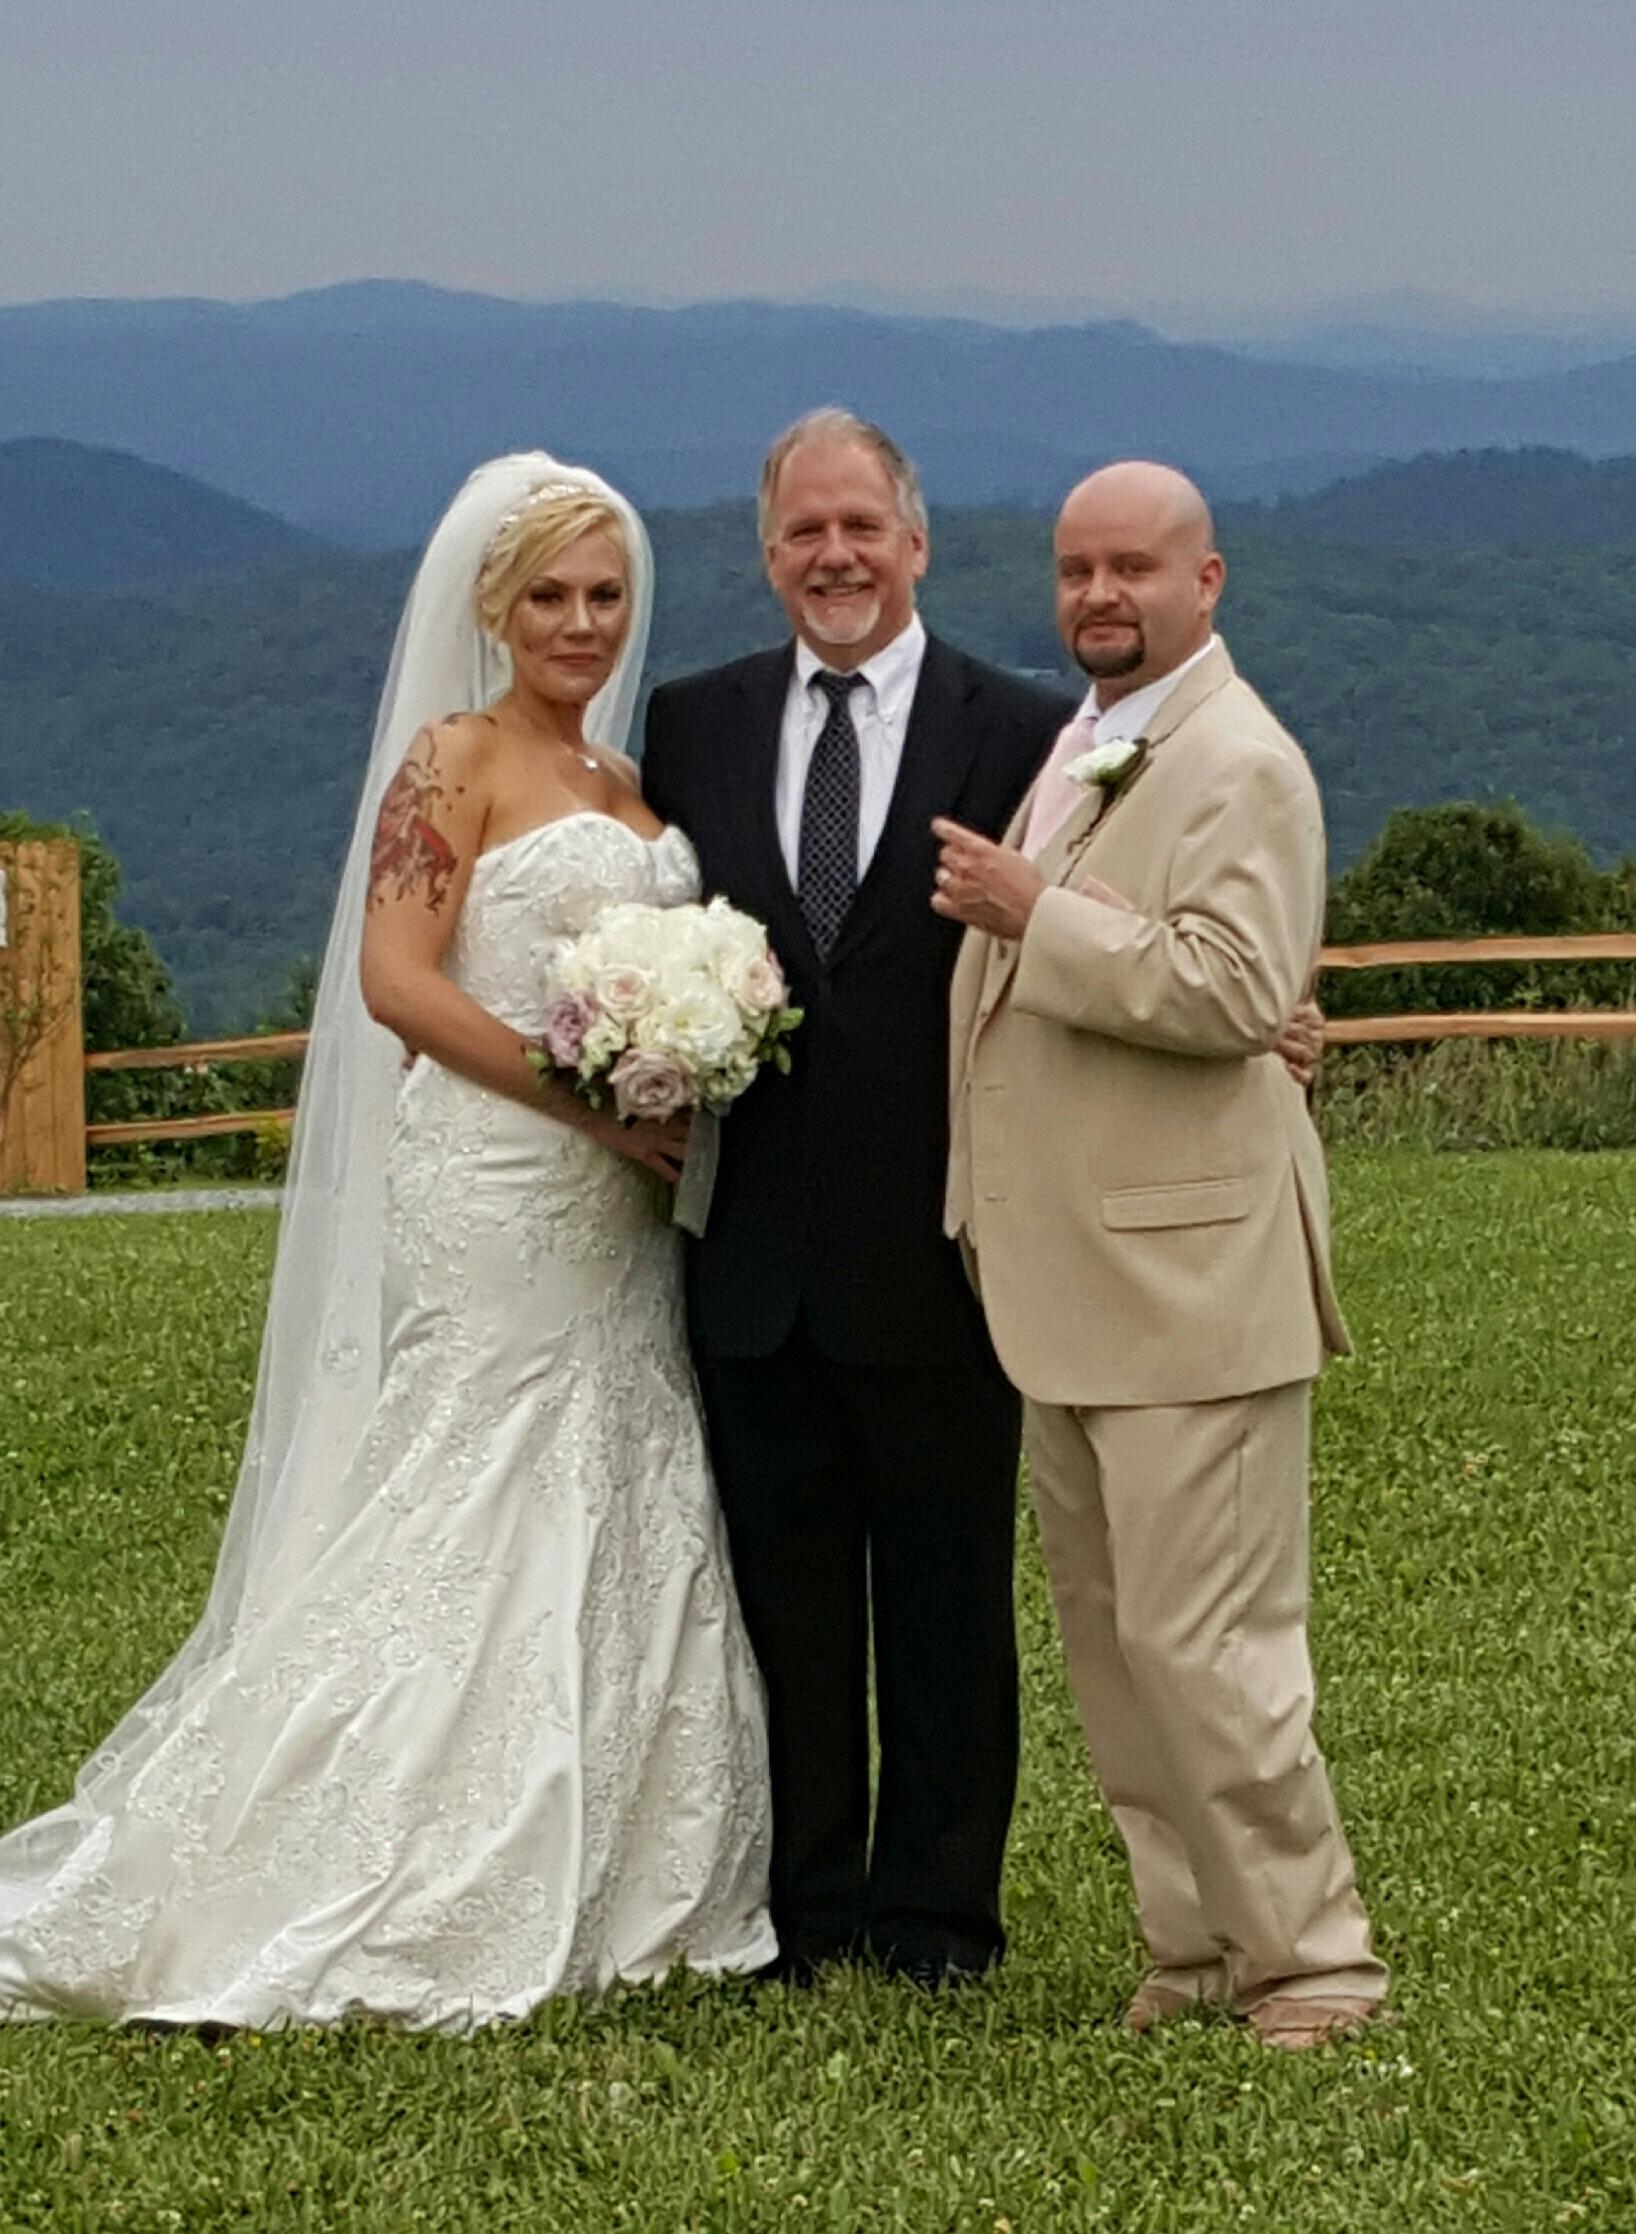 NC Wedding Officiant